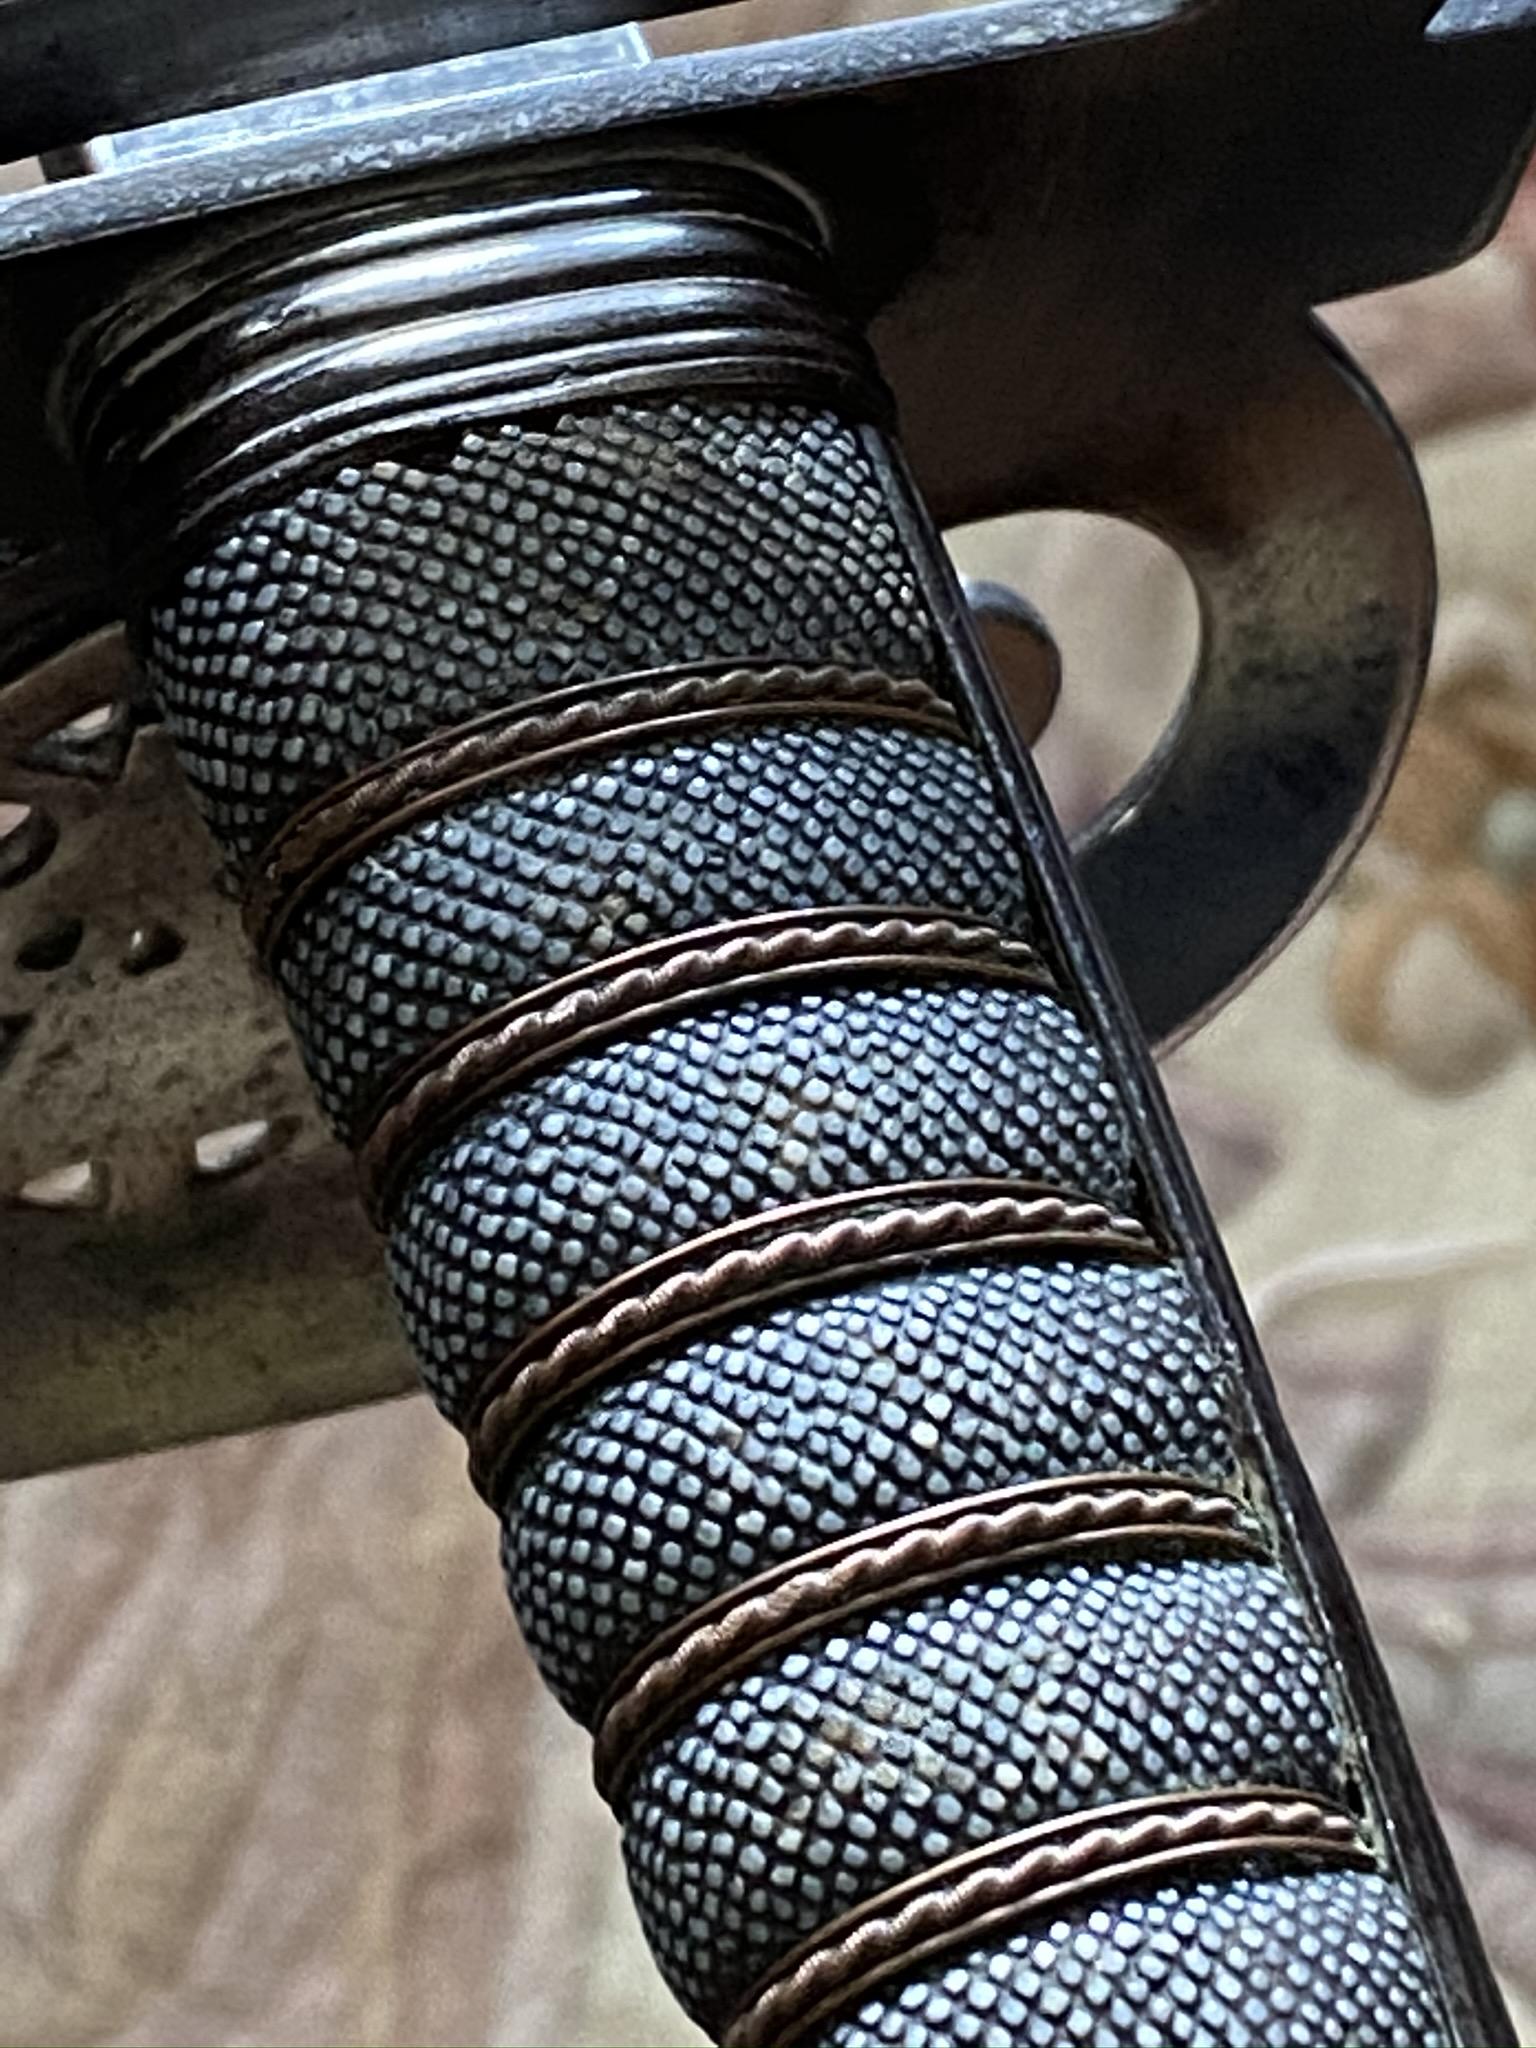 British Sword Appraisal